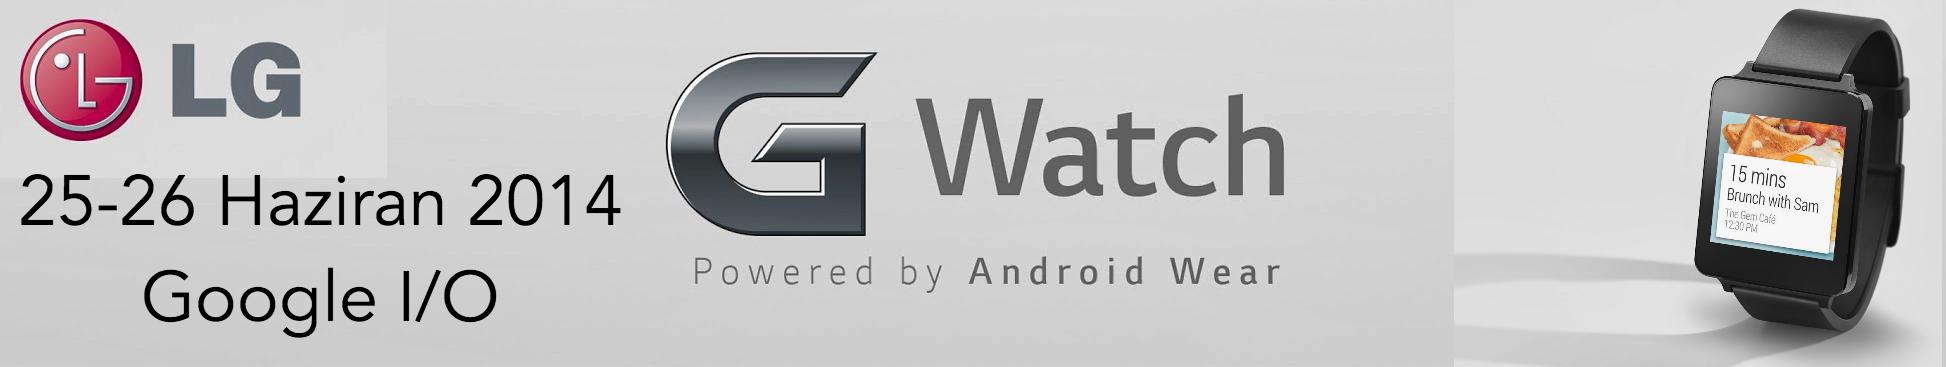 20140500-LG-G-Watch-a